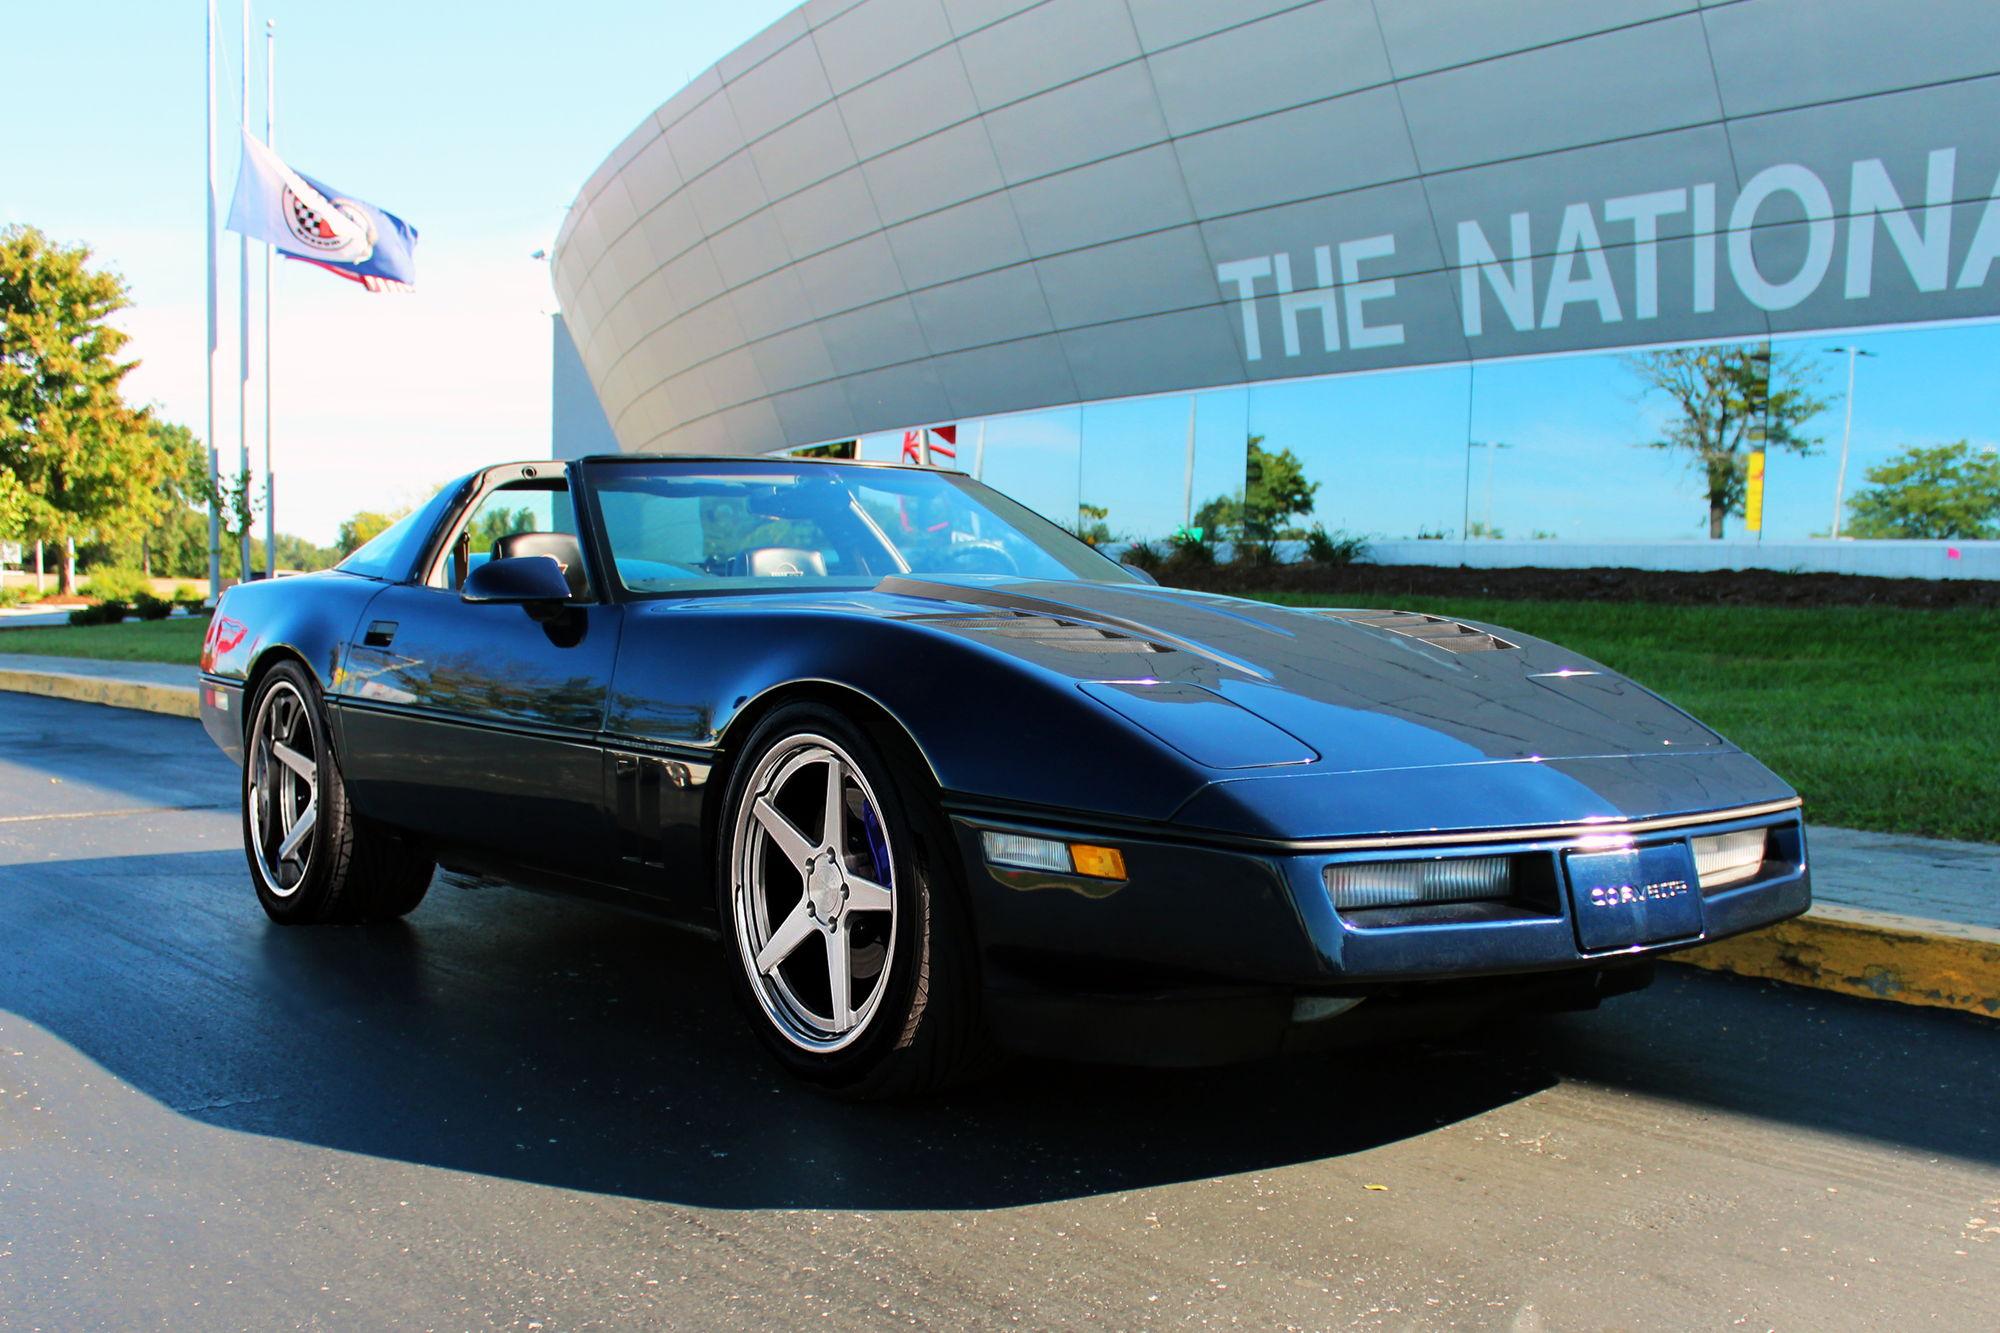 1984 C4 Corvette >> Nicest rims for C4? Pictures? - Page 9 - CorvetteForum - Chevrolet Corvette Forum Discussion